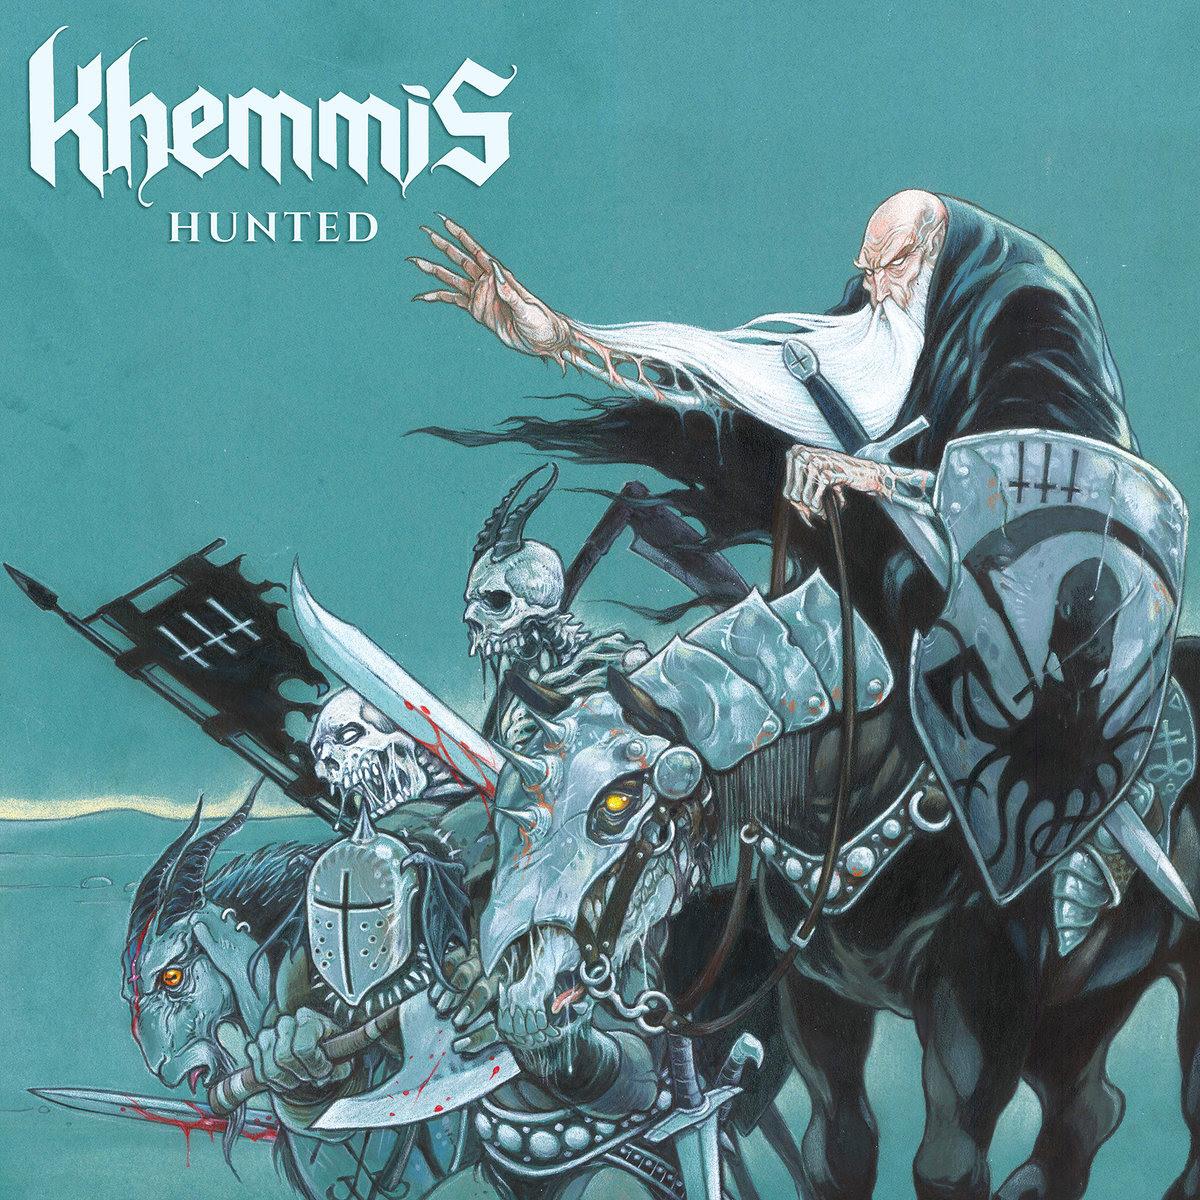 Image result for khemmis hunted